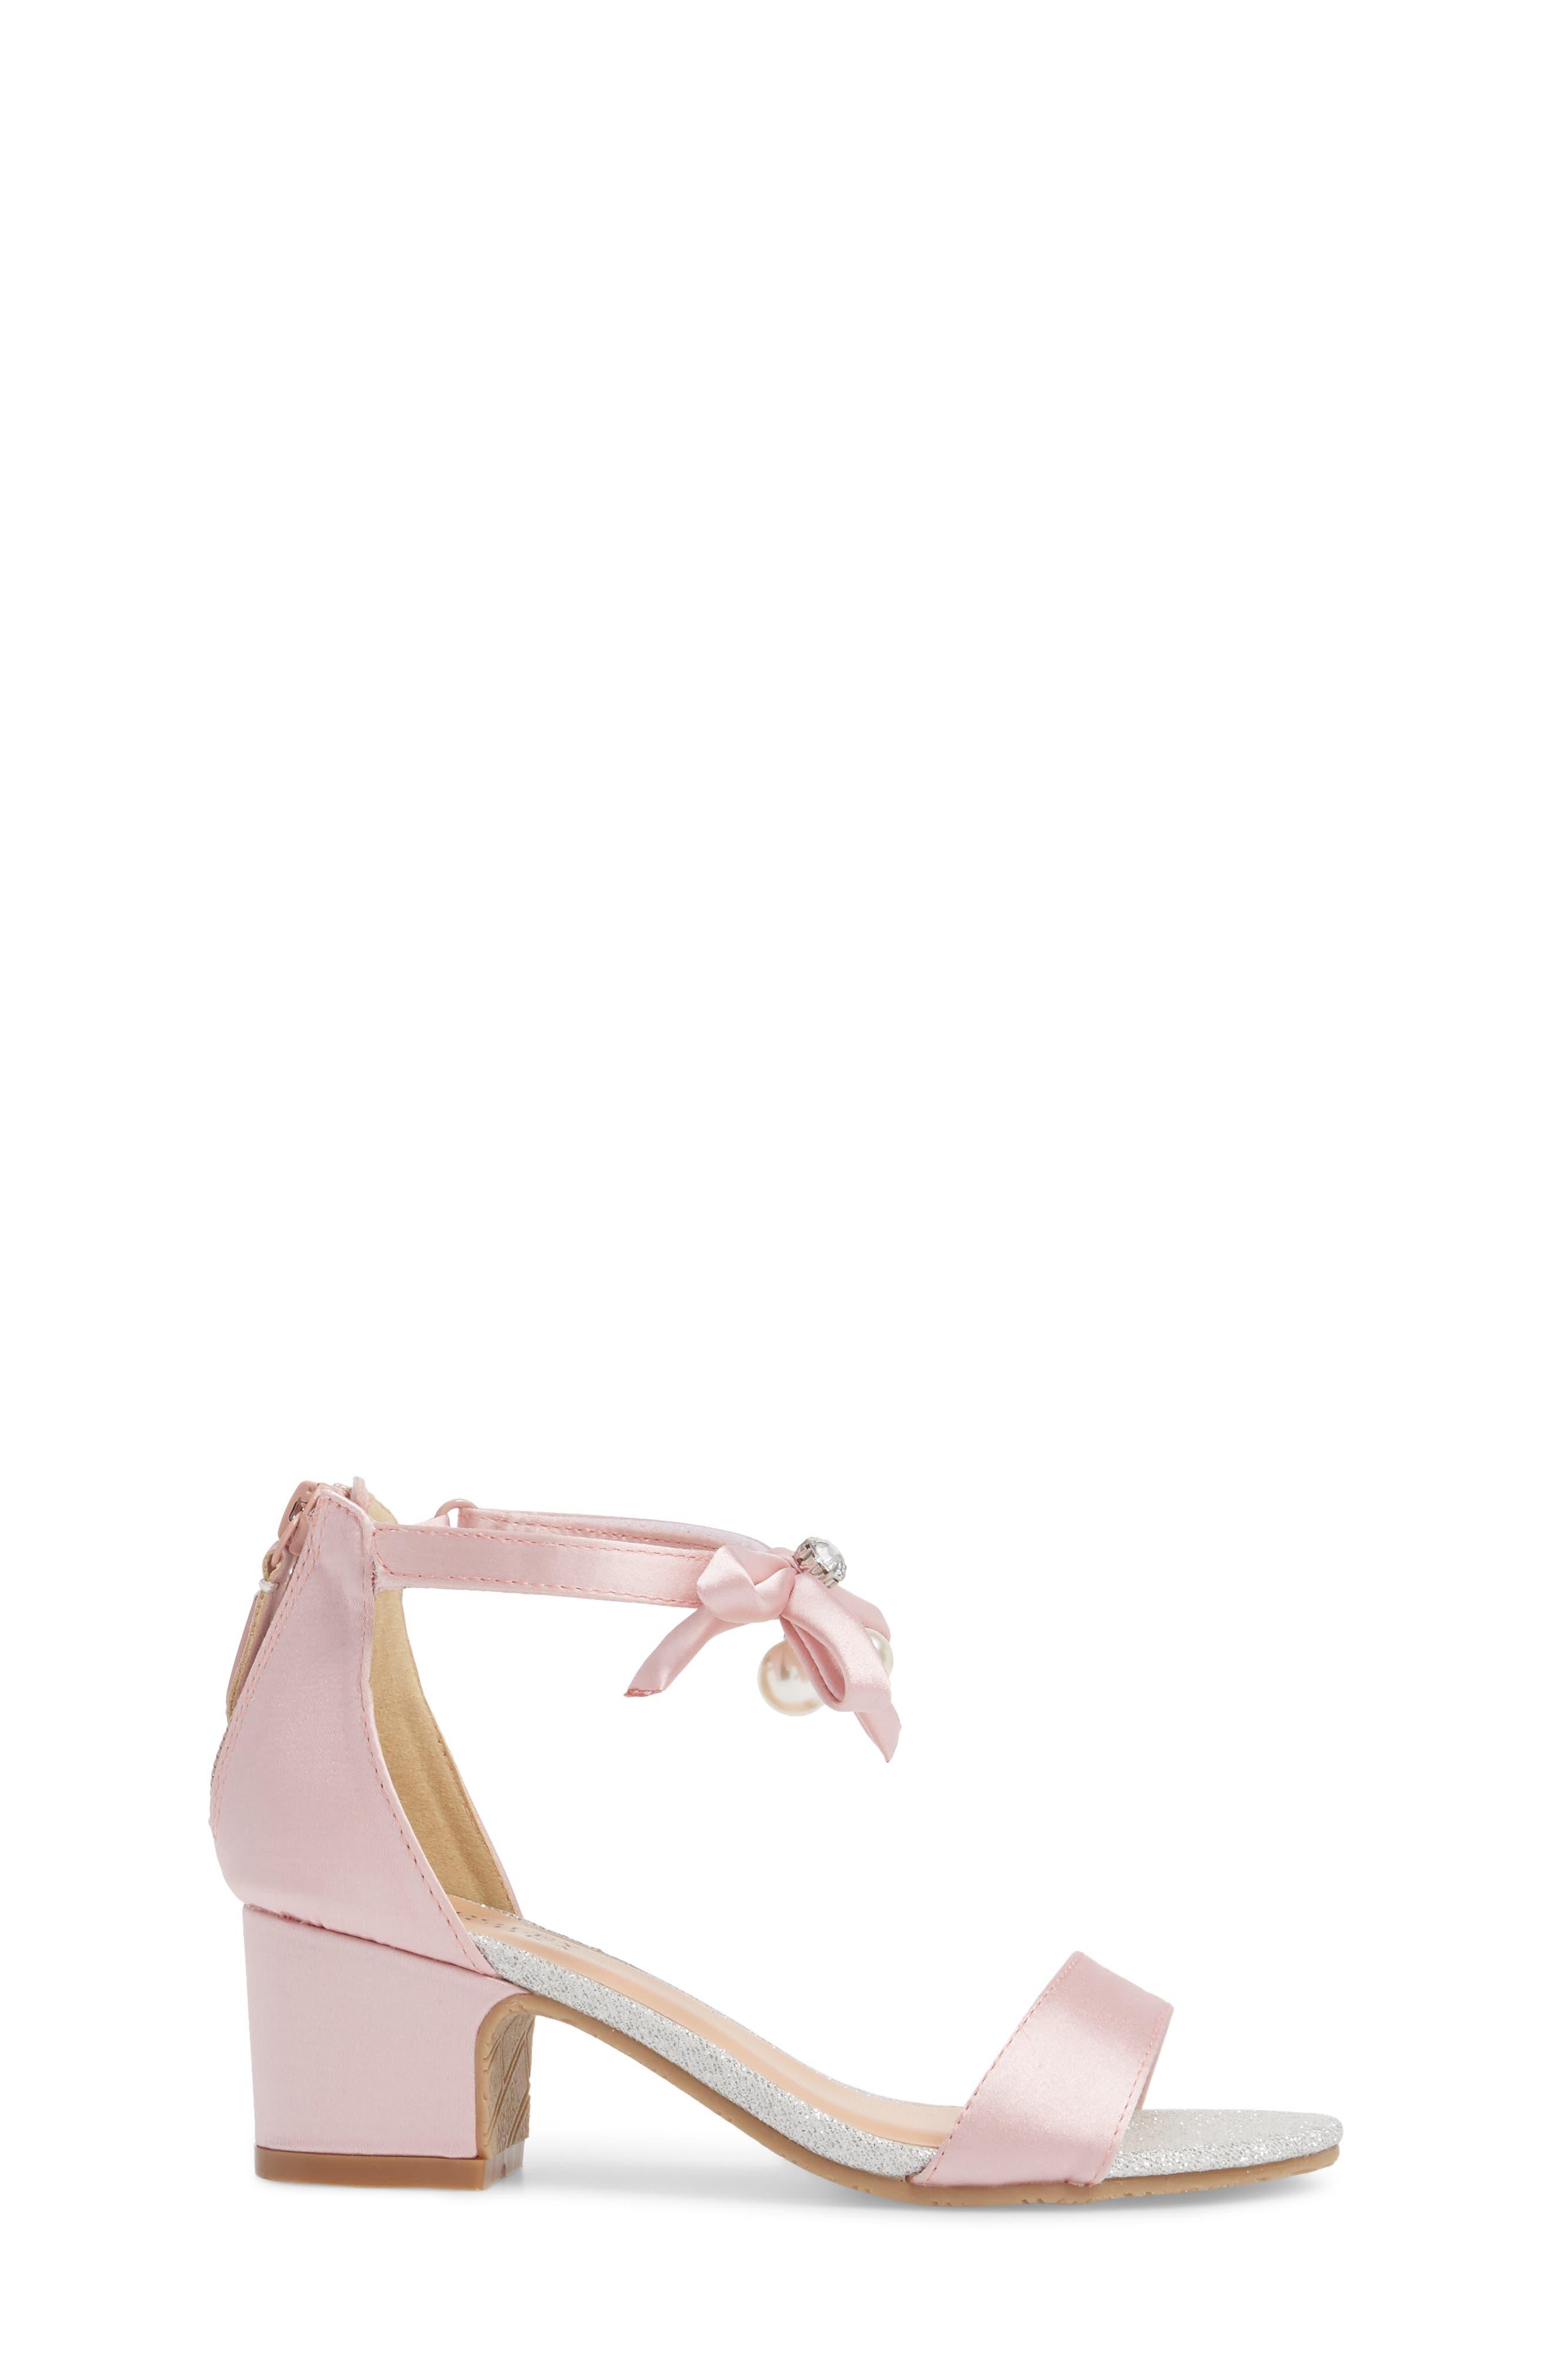 Pernia Embellished Sandal,                             Alternate thumbnail 3, color,                             PINK/ SILVER